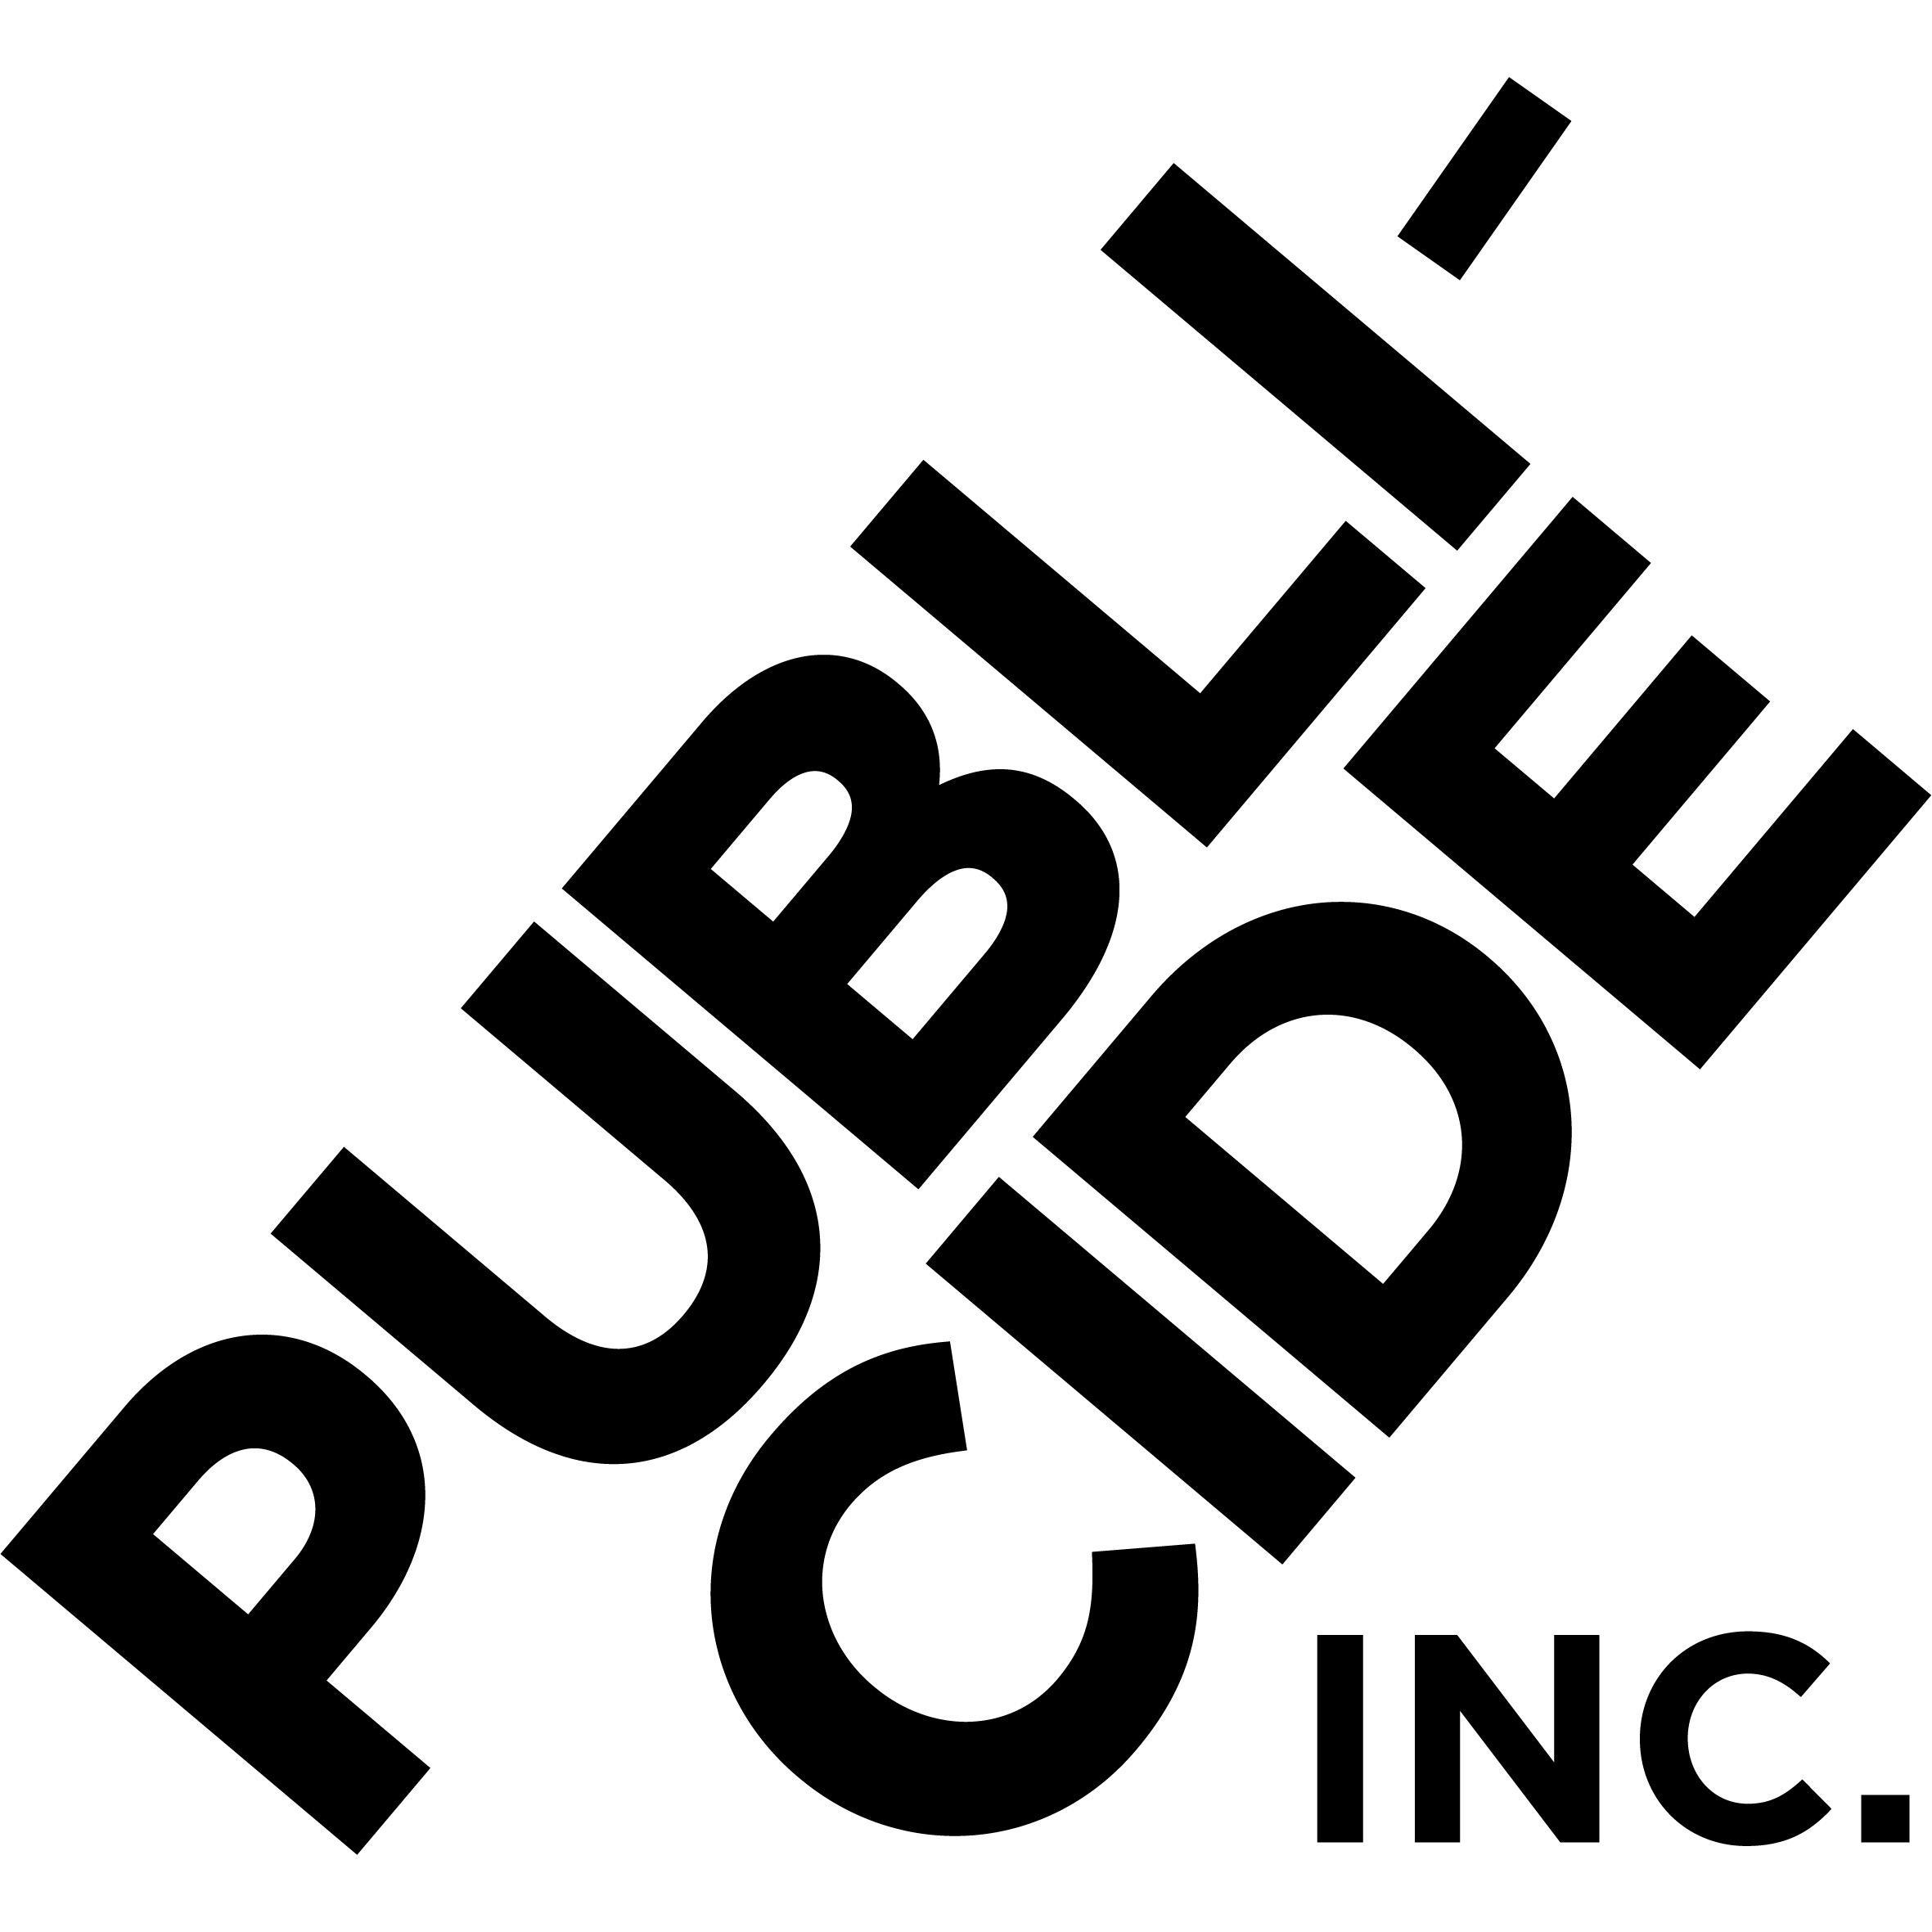 Publicide Inc